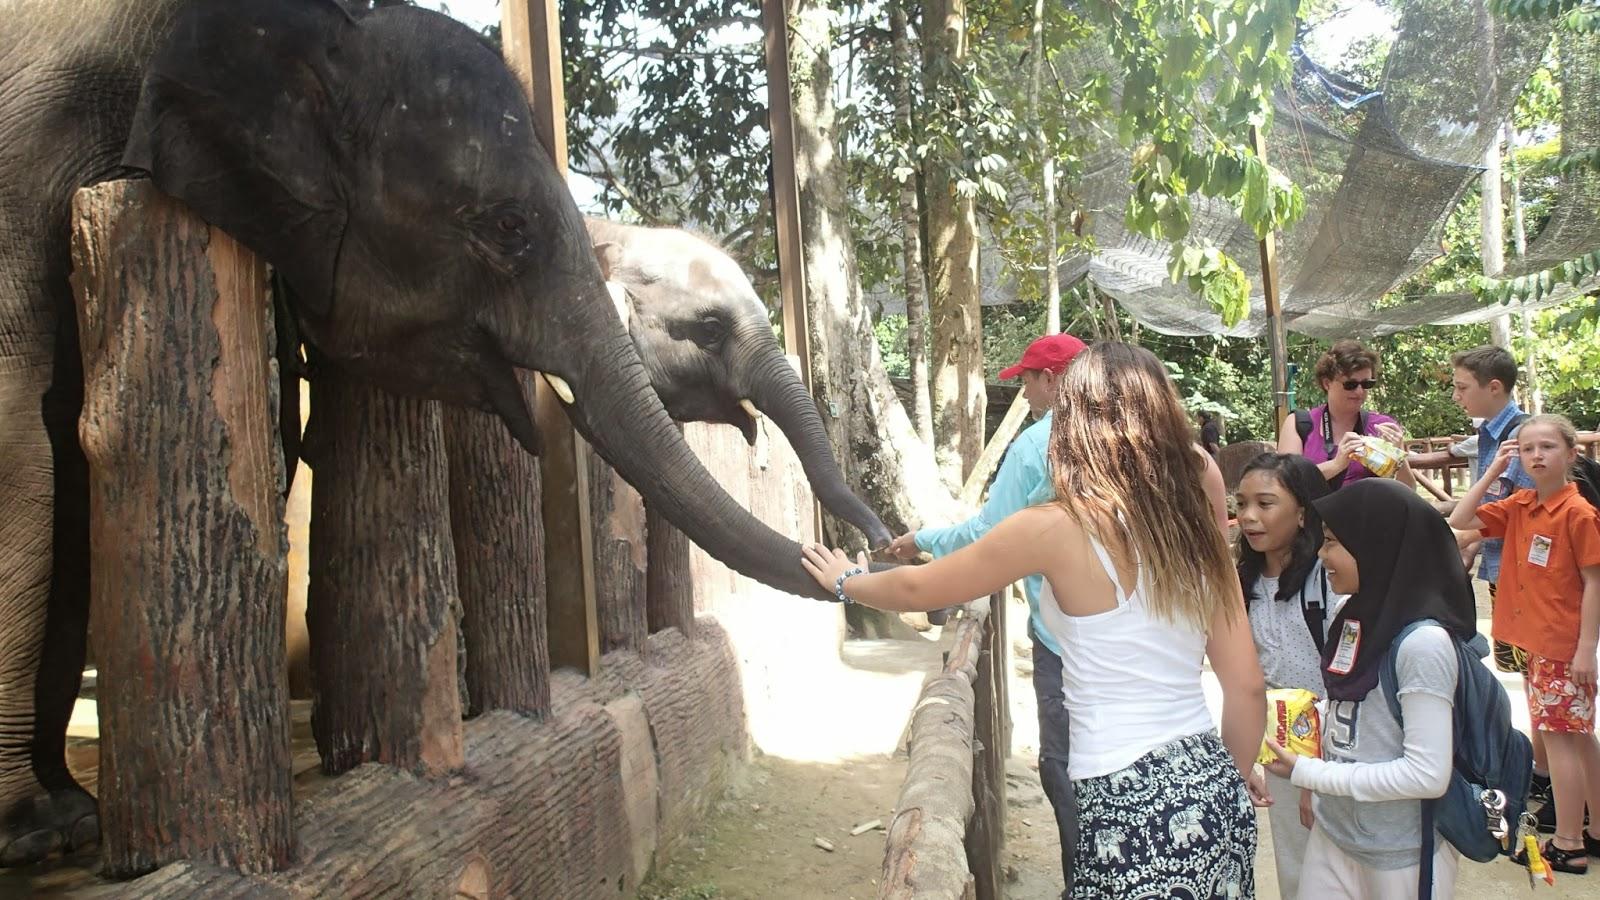 Elephant Sanctuary Kuala Gandah +6019 662 2929  Website : www.malaysia-adventuretours.com